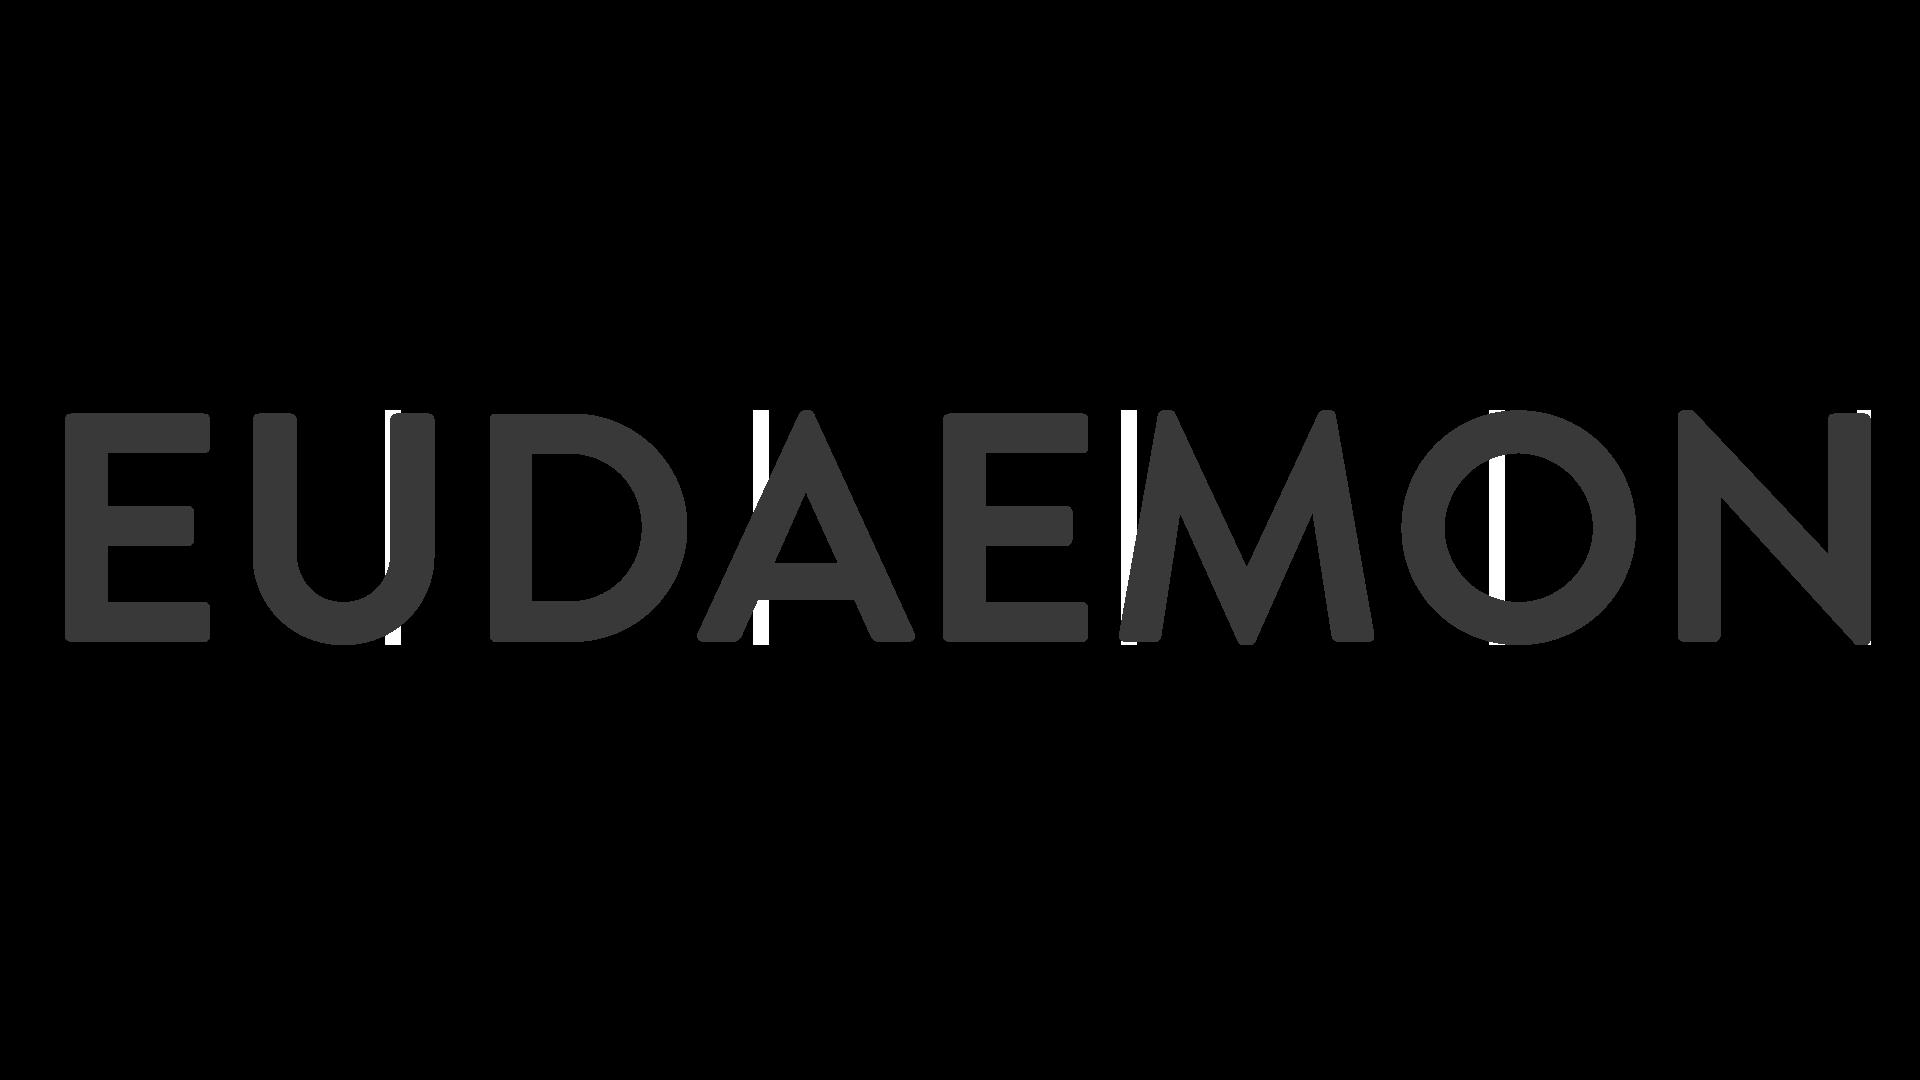 Eudaemon Logo